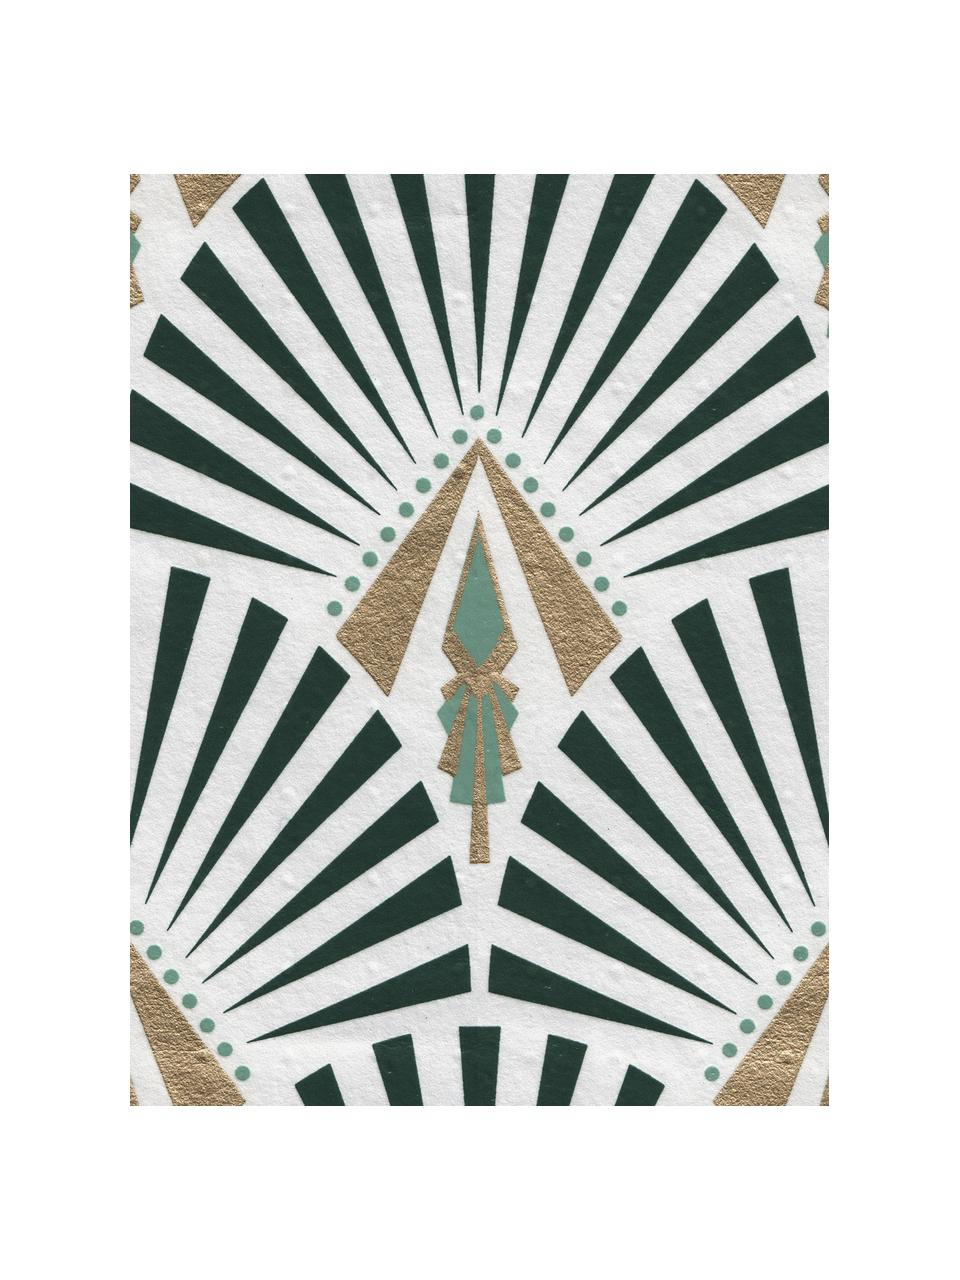 Tapete Luxus Geometric Art, Vlies, Weiß, Grün, Dunkelgrün, Goldfarben, 52 x 1005 cm